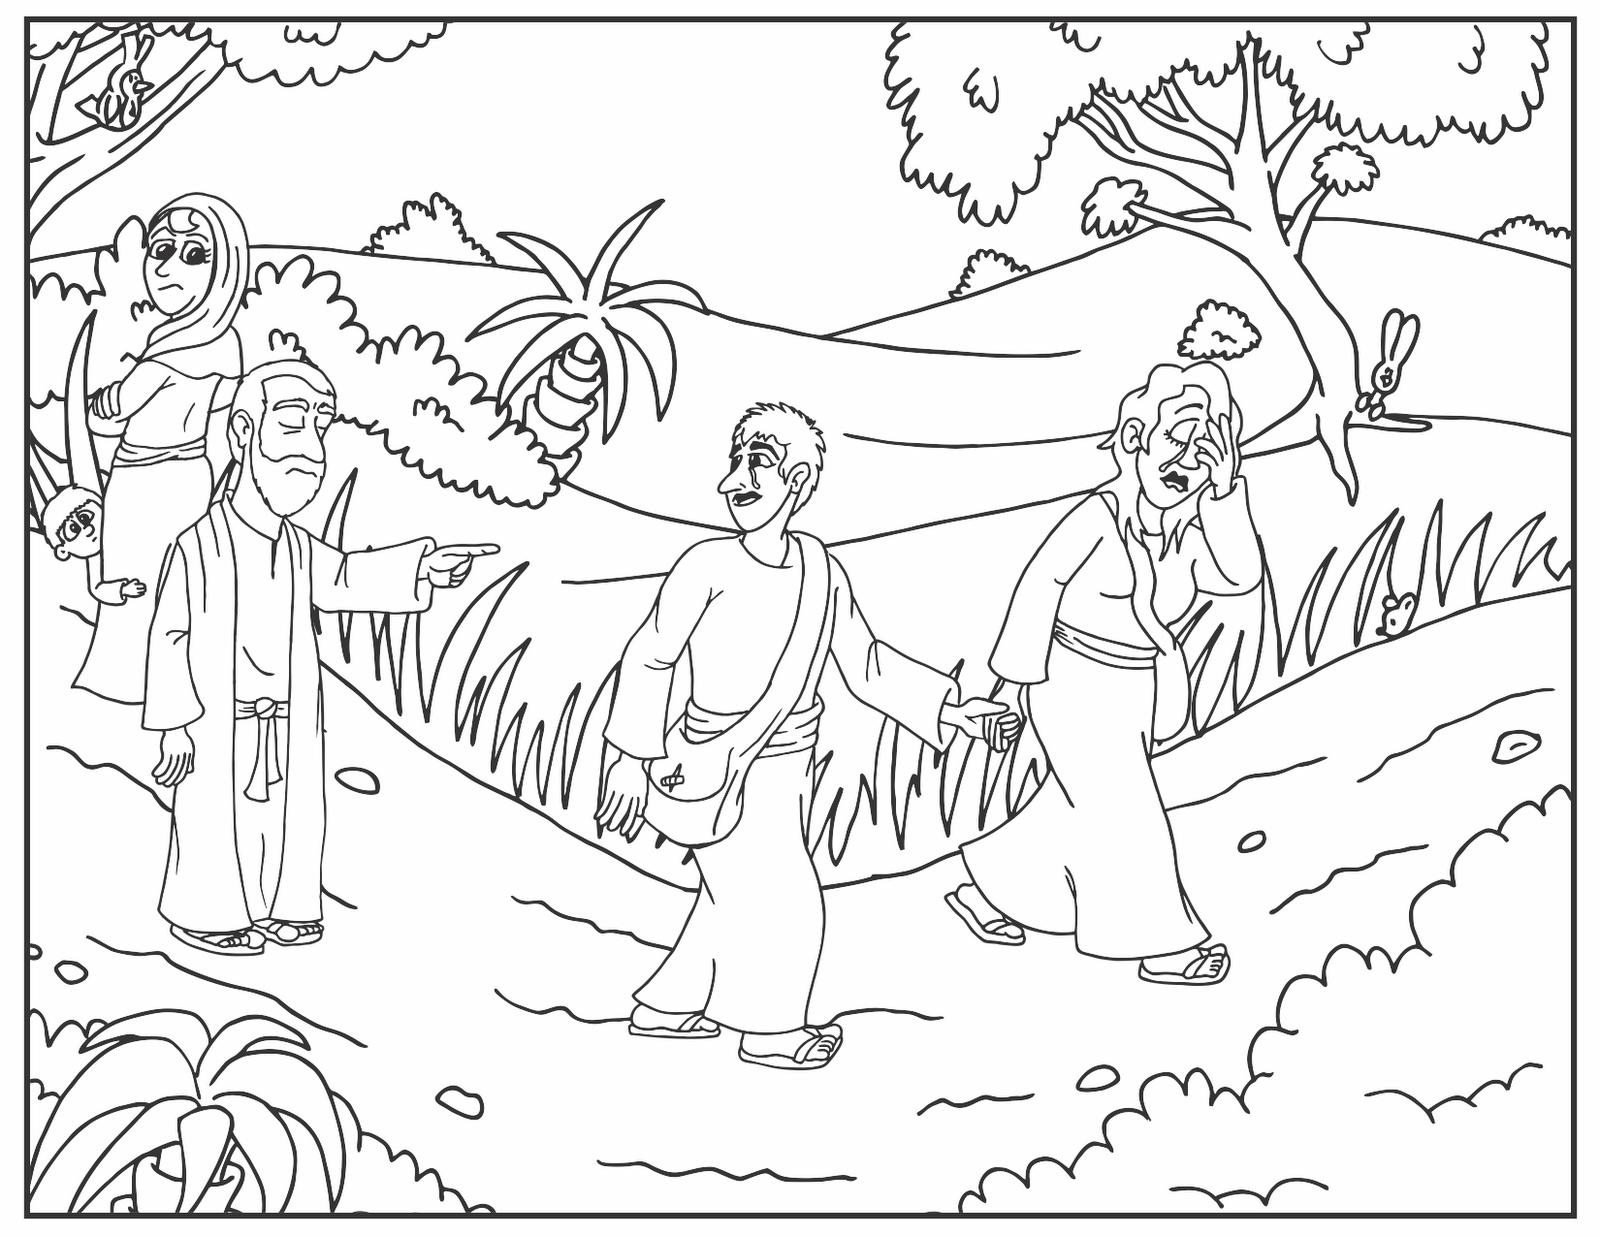 Abraham coloring pages isaac and ishmael